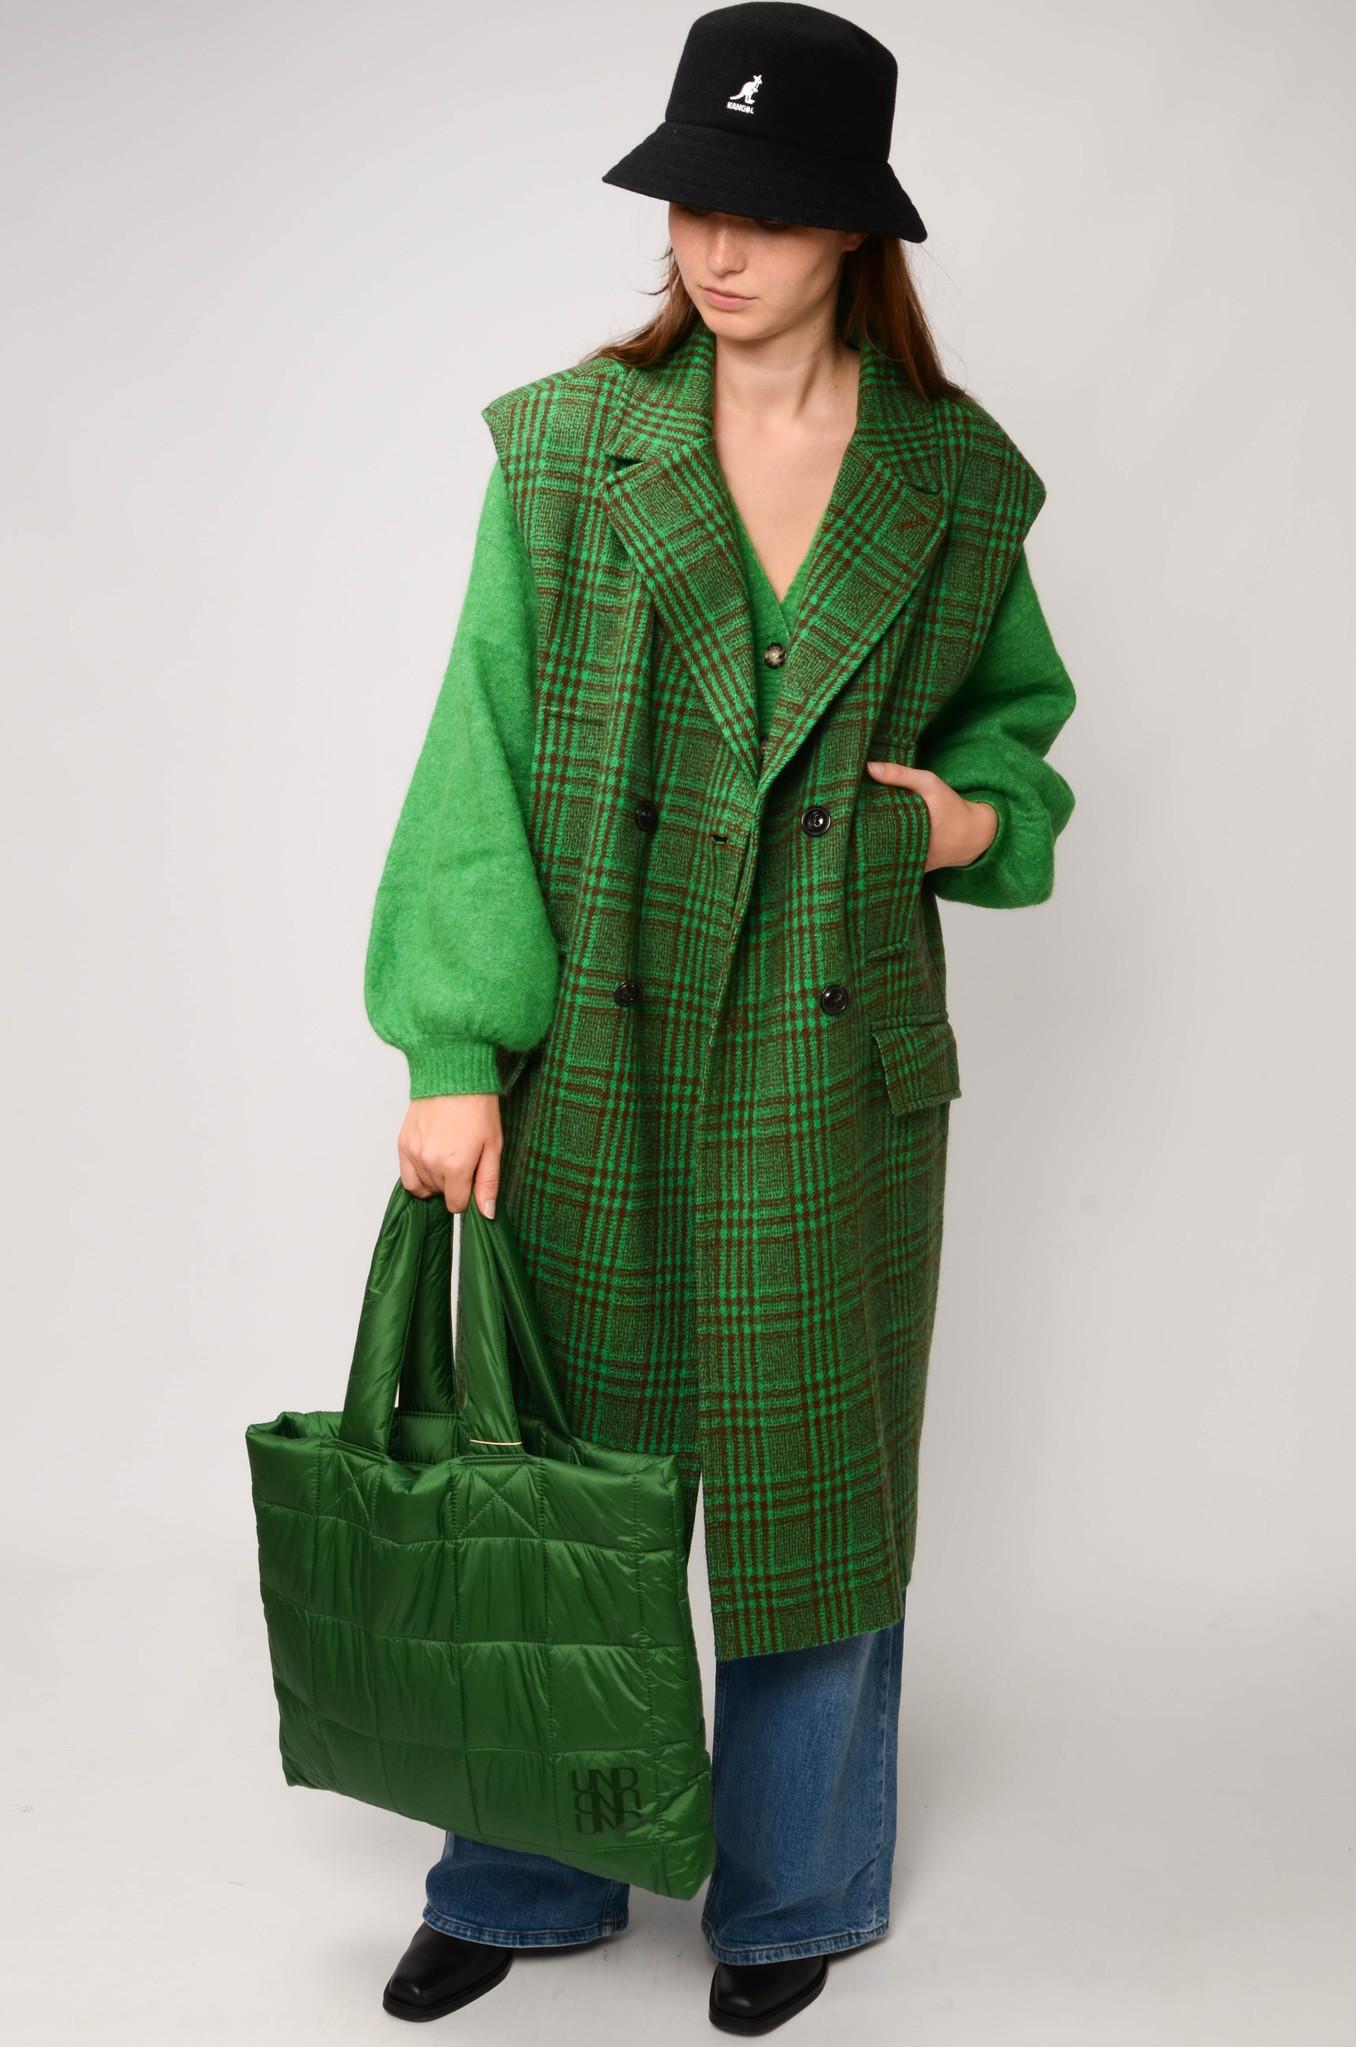 DECKA COAT IN GREEN CHECK-6